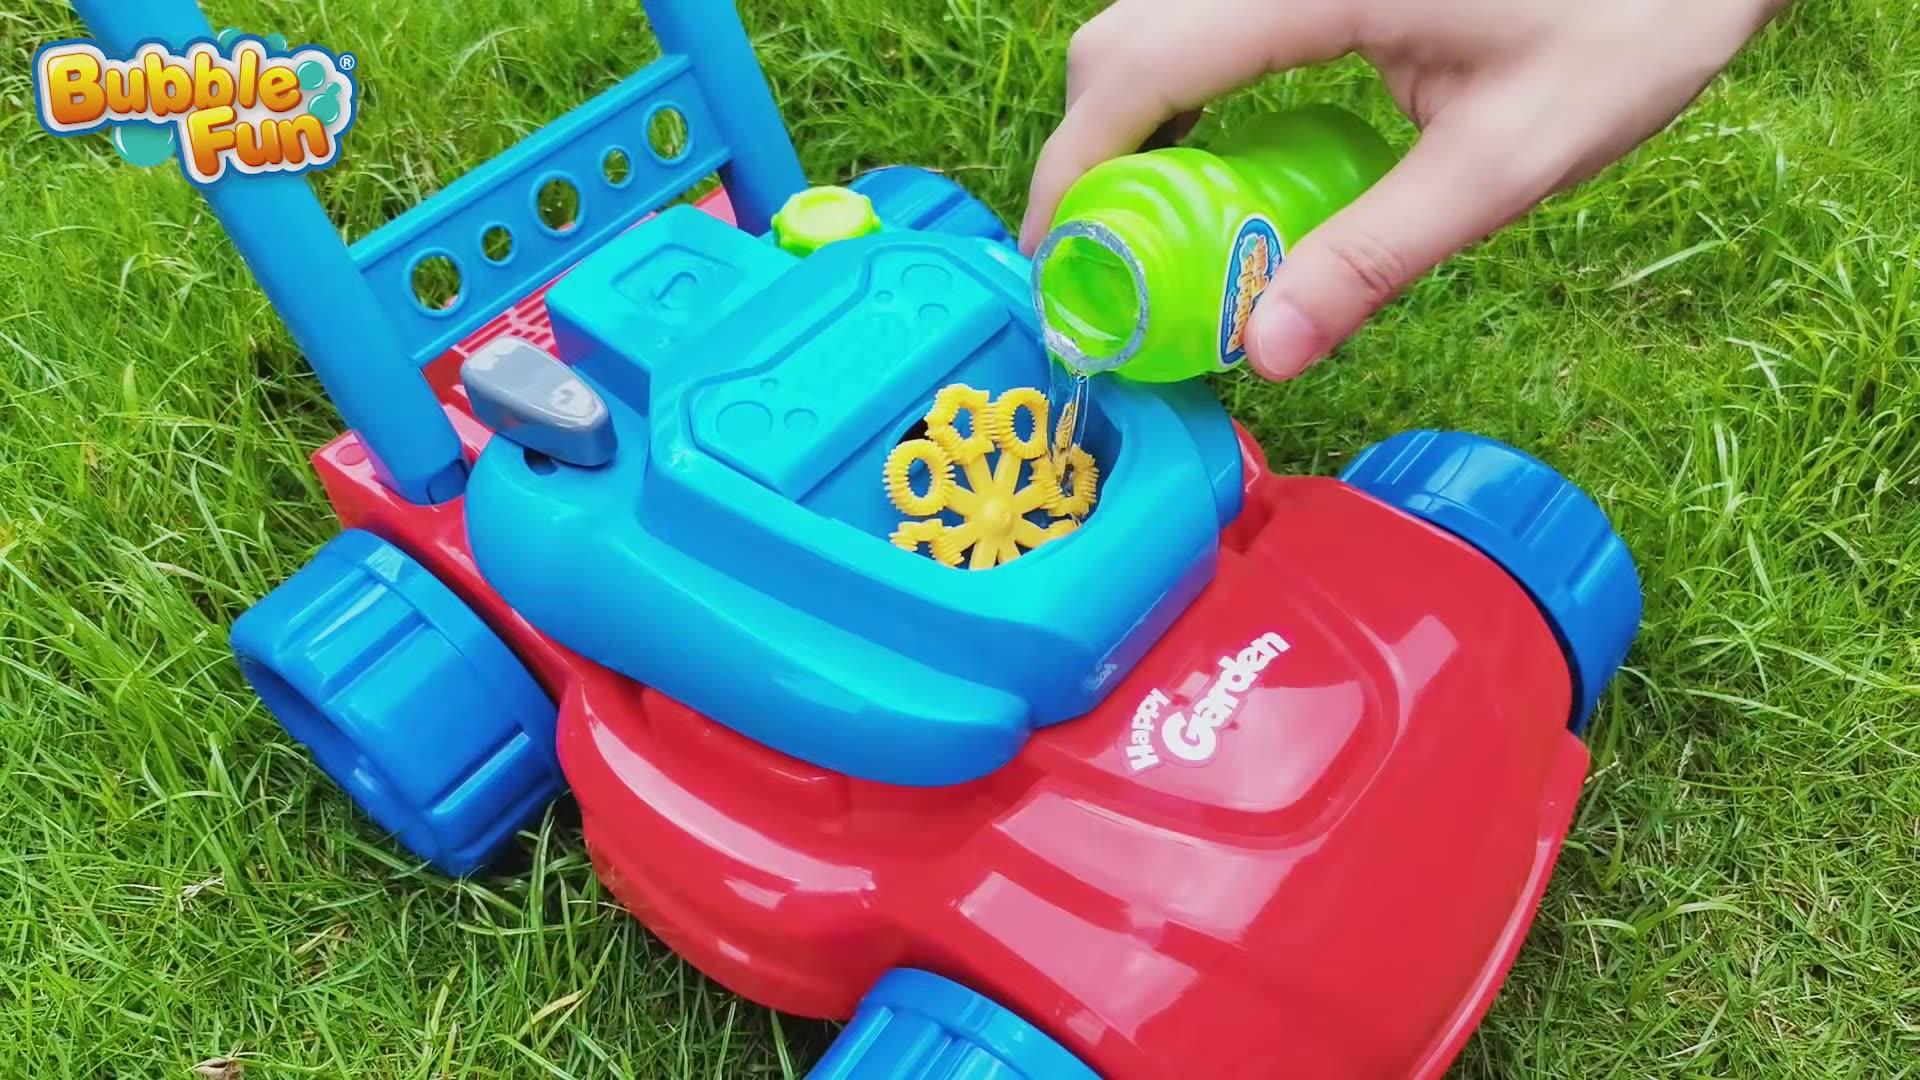 Gelembung Mesin Pemotong Rumput Mainan Otomatis Mesin Bubble Bubble Blower untuk Taman Anak-anak-Outdoor & Indoor Mainan untuk Balita